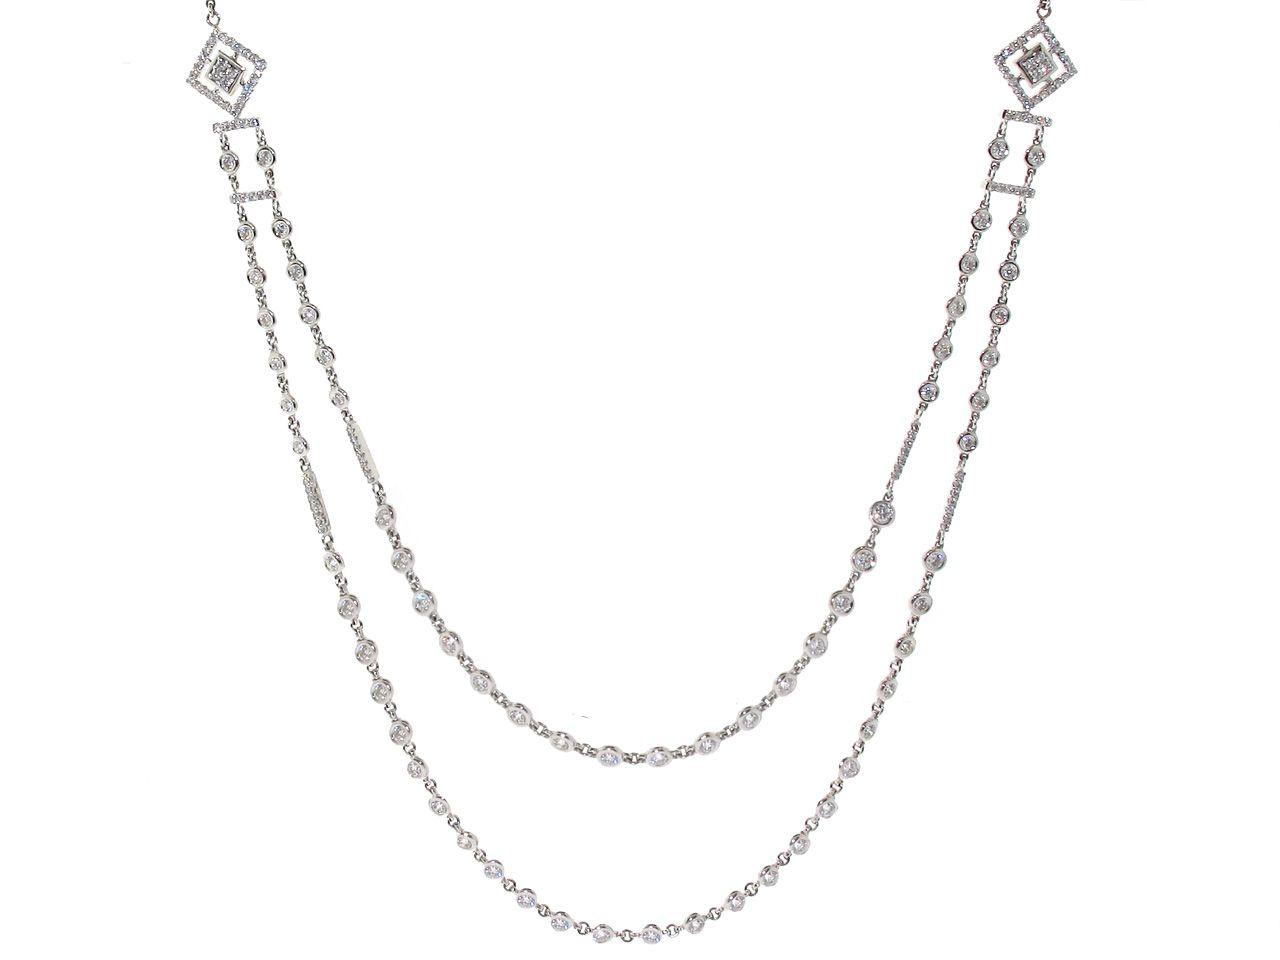 Diamond Sautoir Necklace In 18k | Divine Diamonds | Jewelry With Regard To Newest White Gold Diamond Sautoir Necklaces (View 3 of 25)